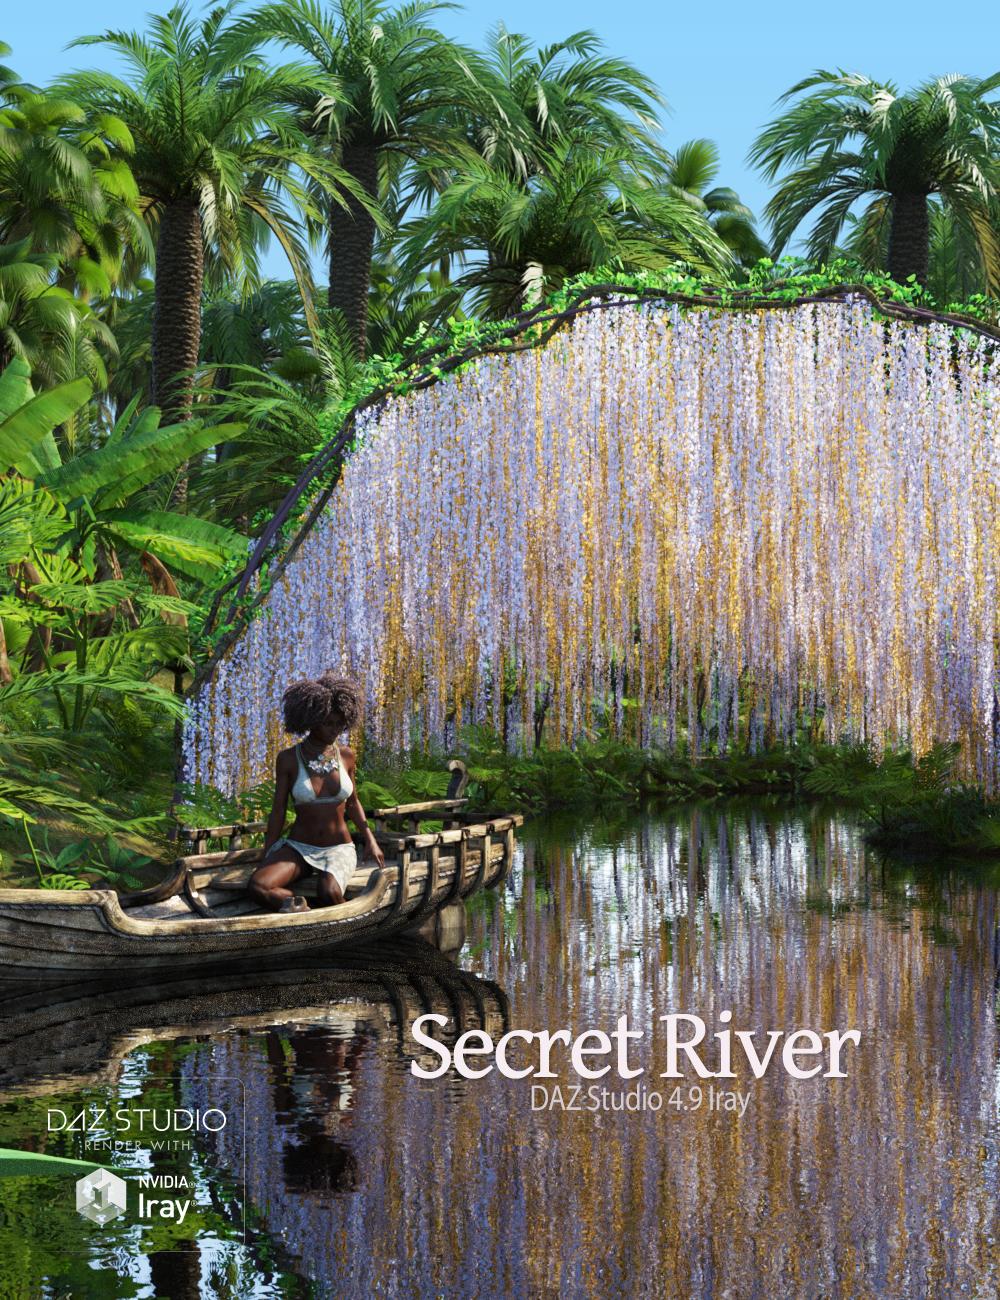 Secret River by: Andrey PestryakovPeanterra, 3D Models by Daz 3D